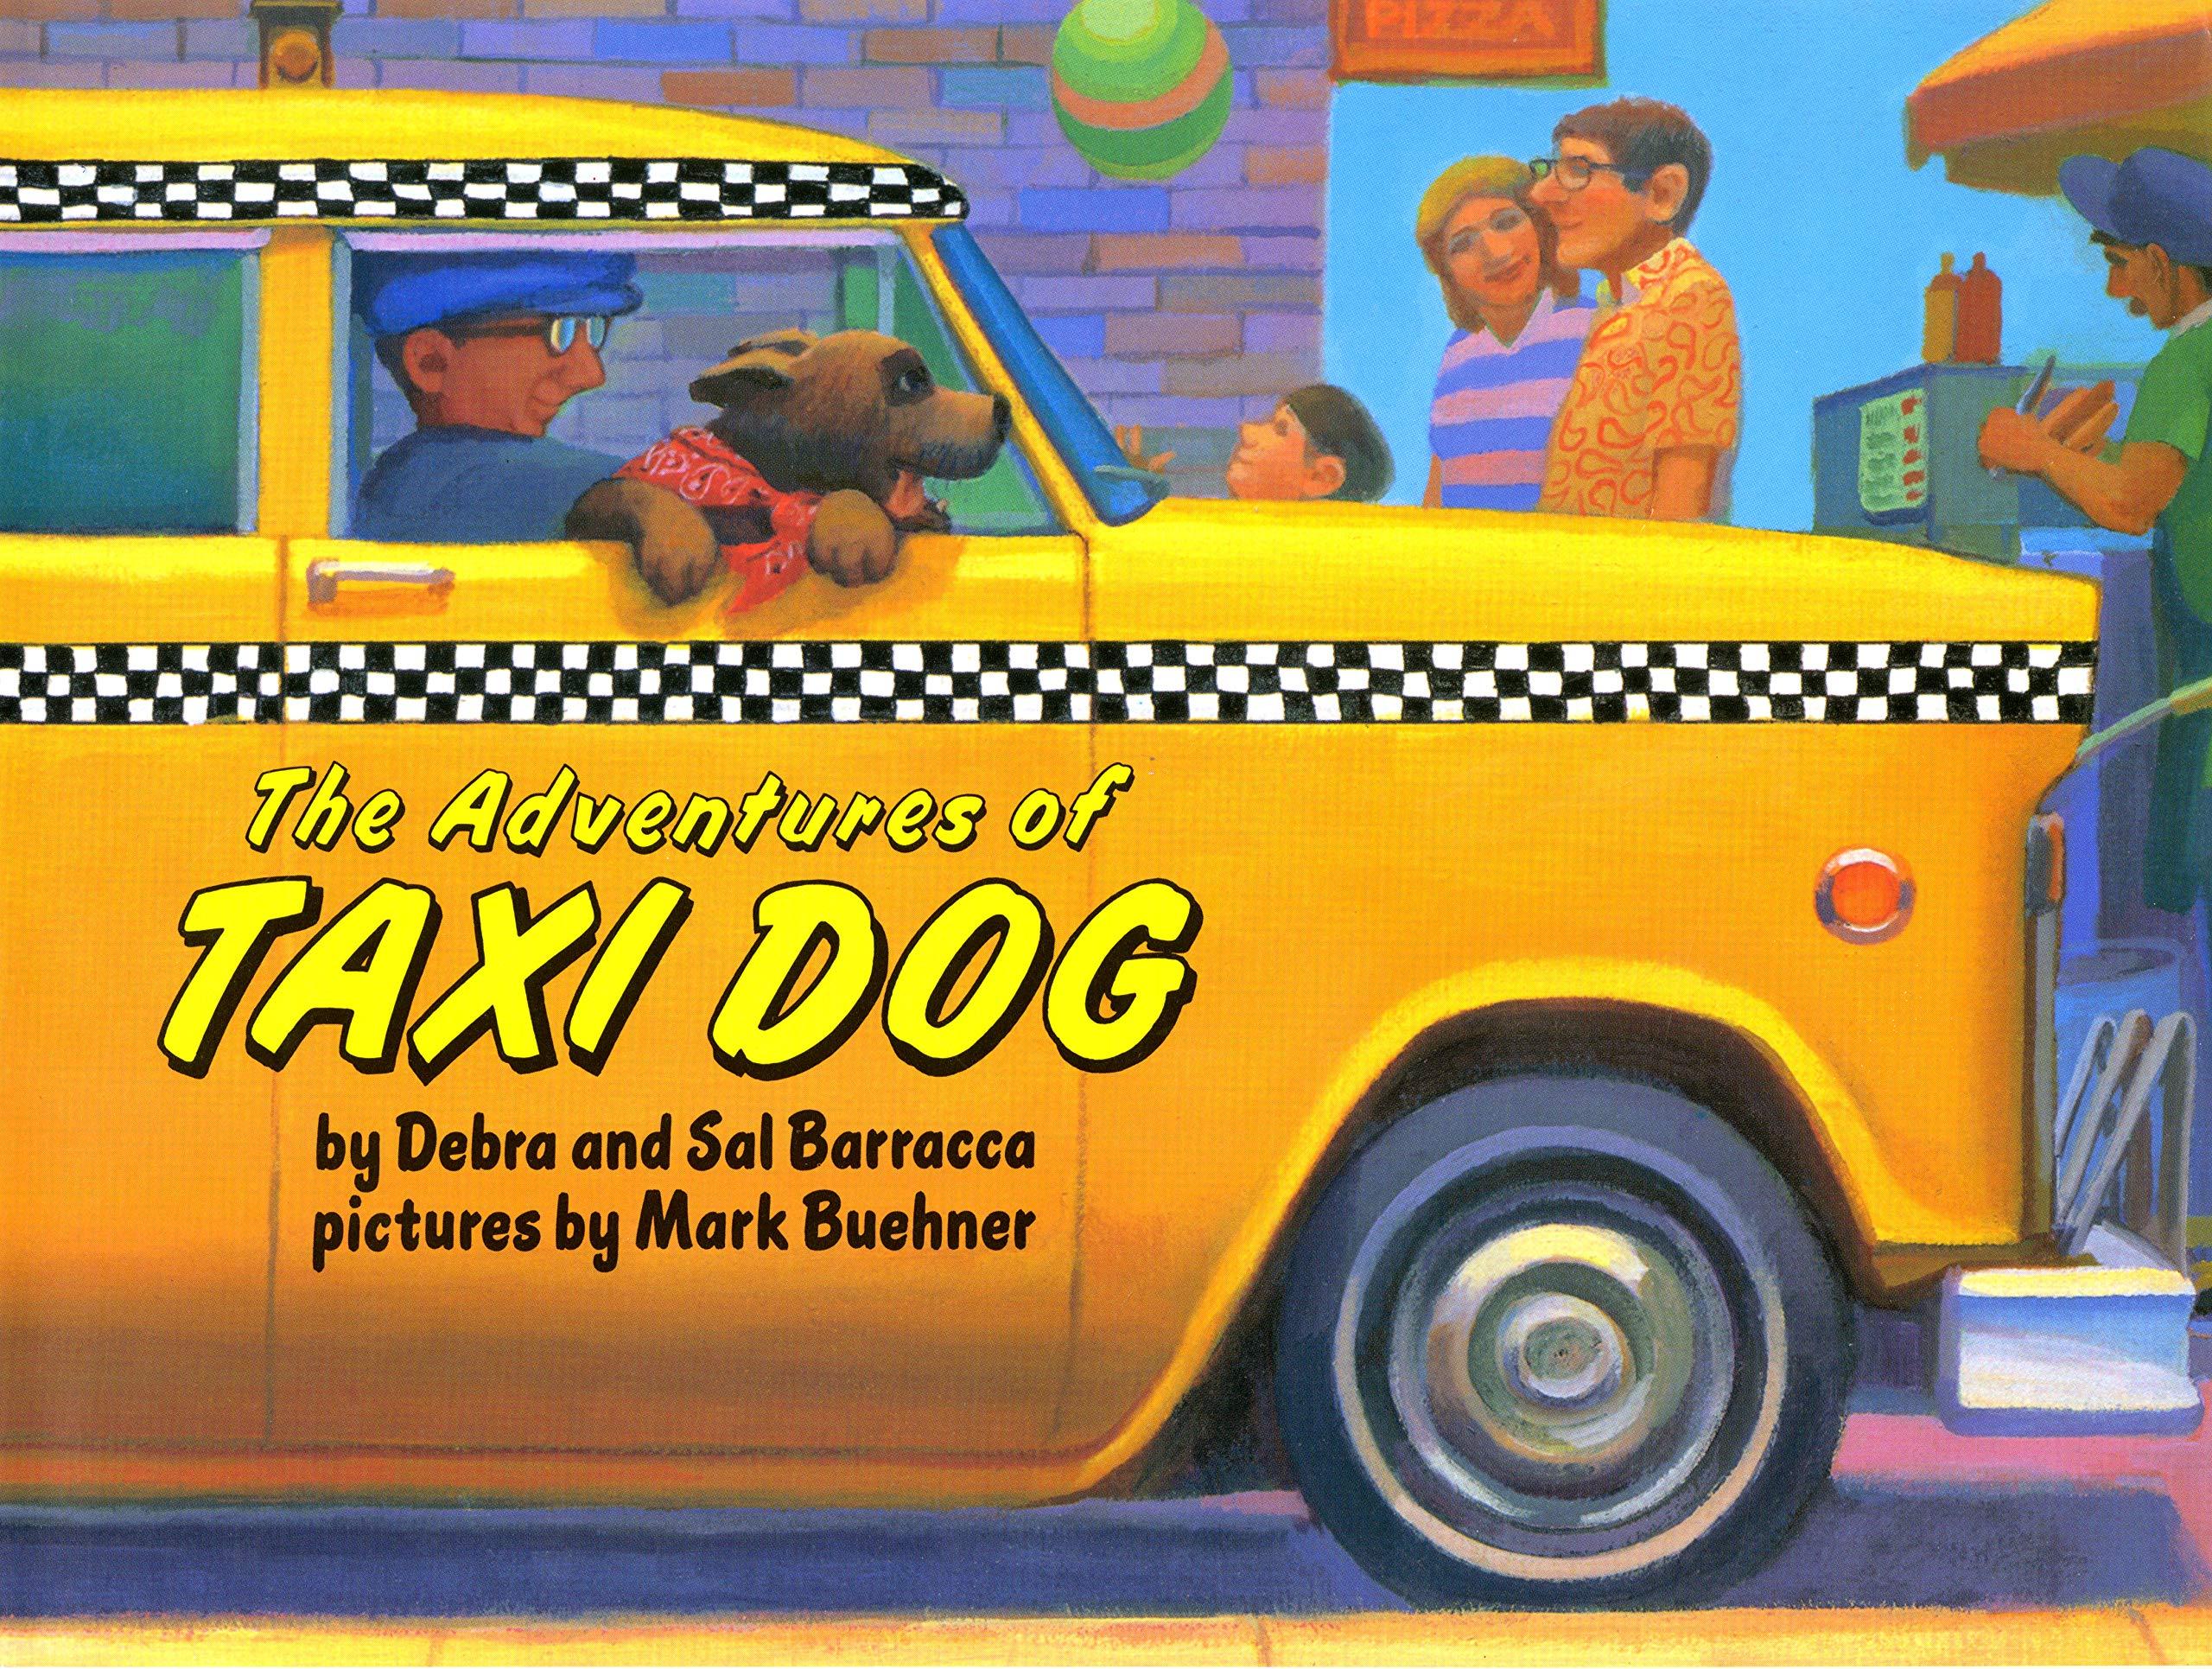 The Adventures of Taxi Dog: Debra Barracca, Sal Barracca